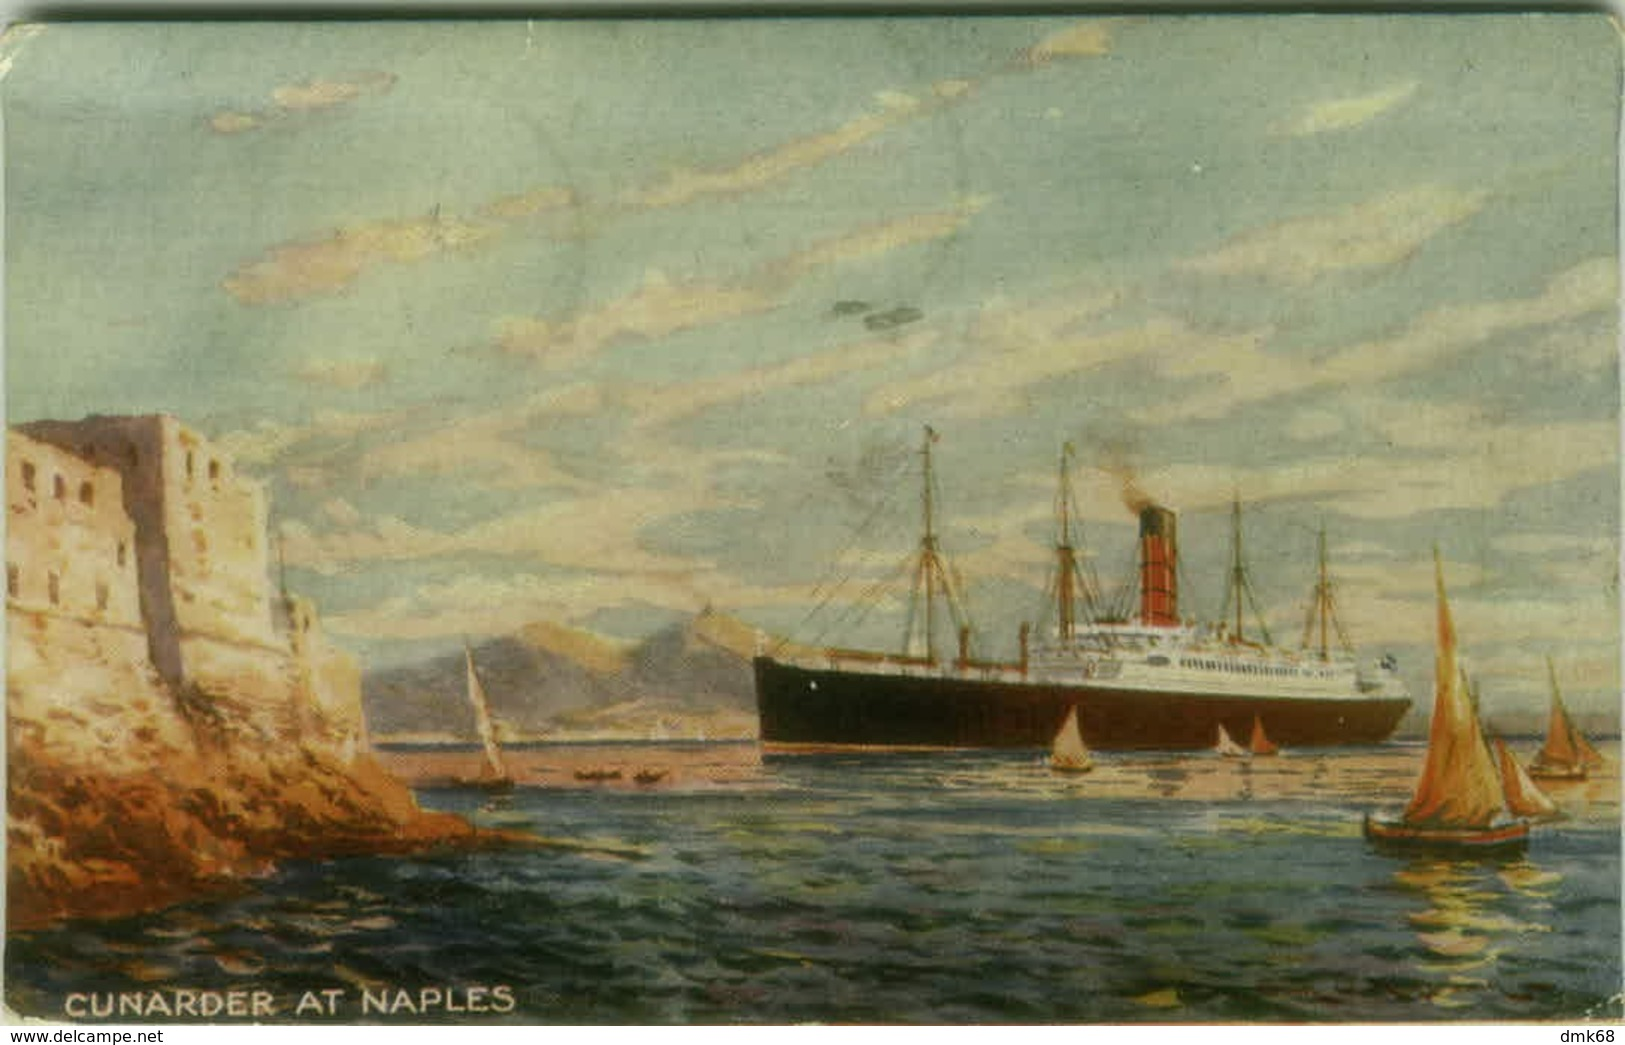 NAPOLI - CUNARDER AT NAPLES - BOAT / SHIP - 1917 (3674) - Napoli (Naples)